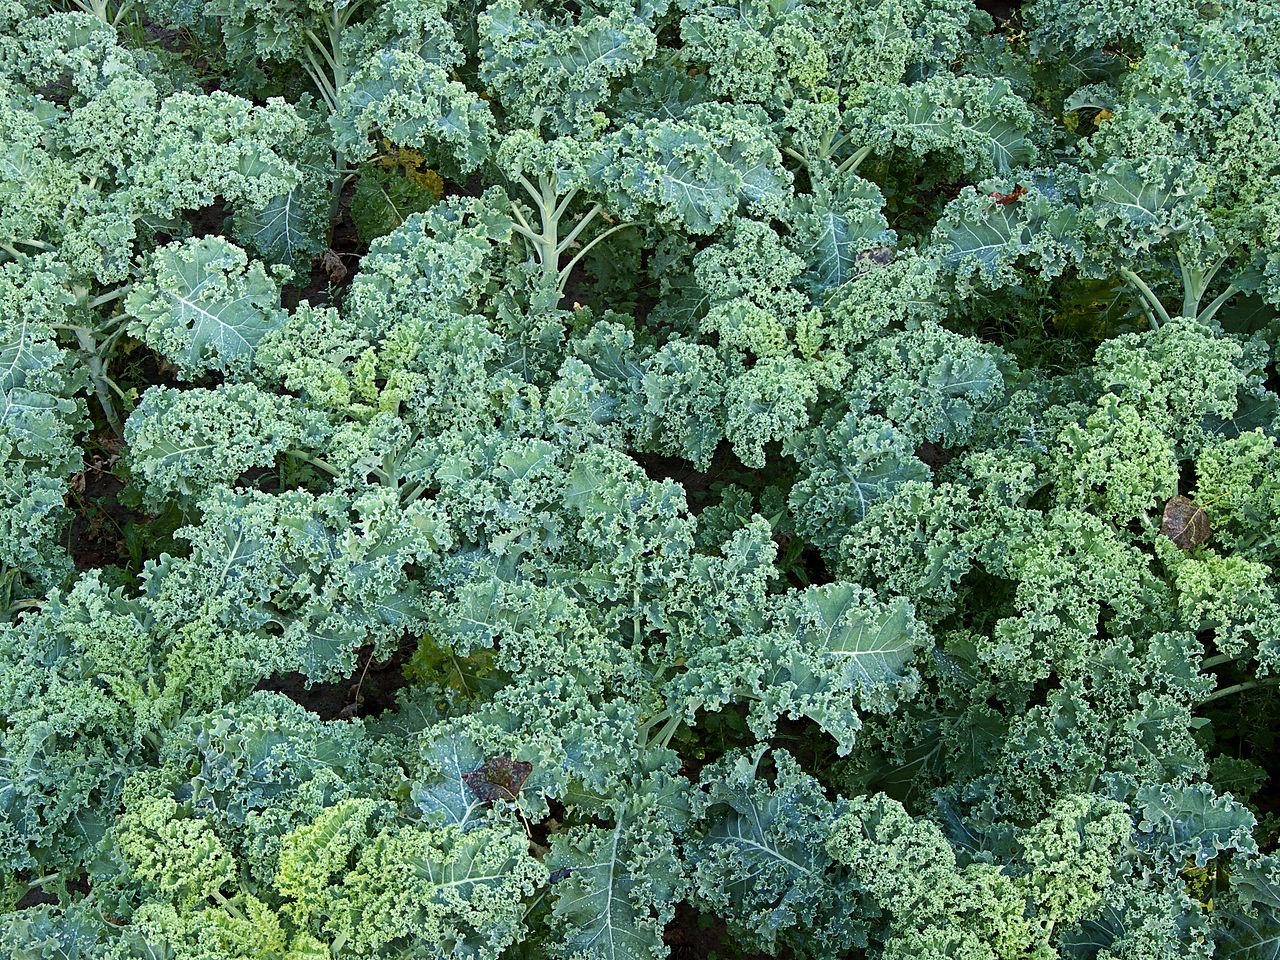 Kapusta kŕmna (Brassica oleracea convar. acephala)